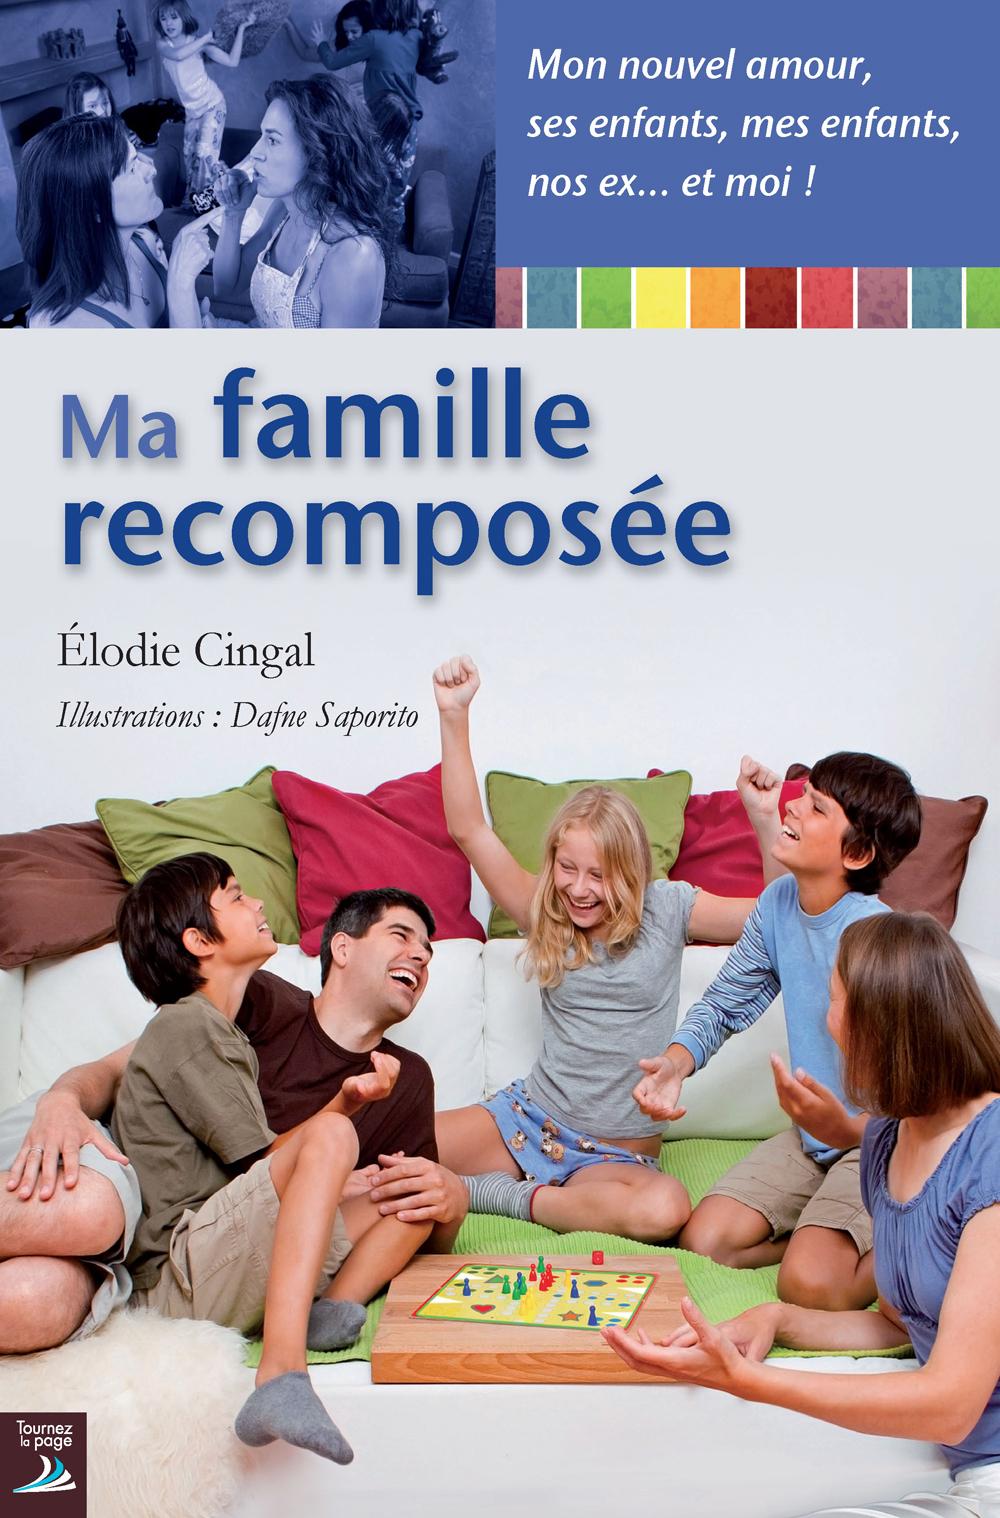 MA FAMILLE RECOMPOSEE